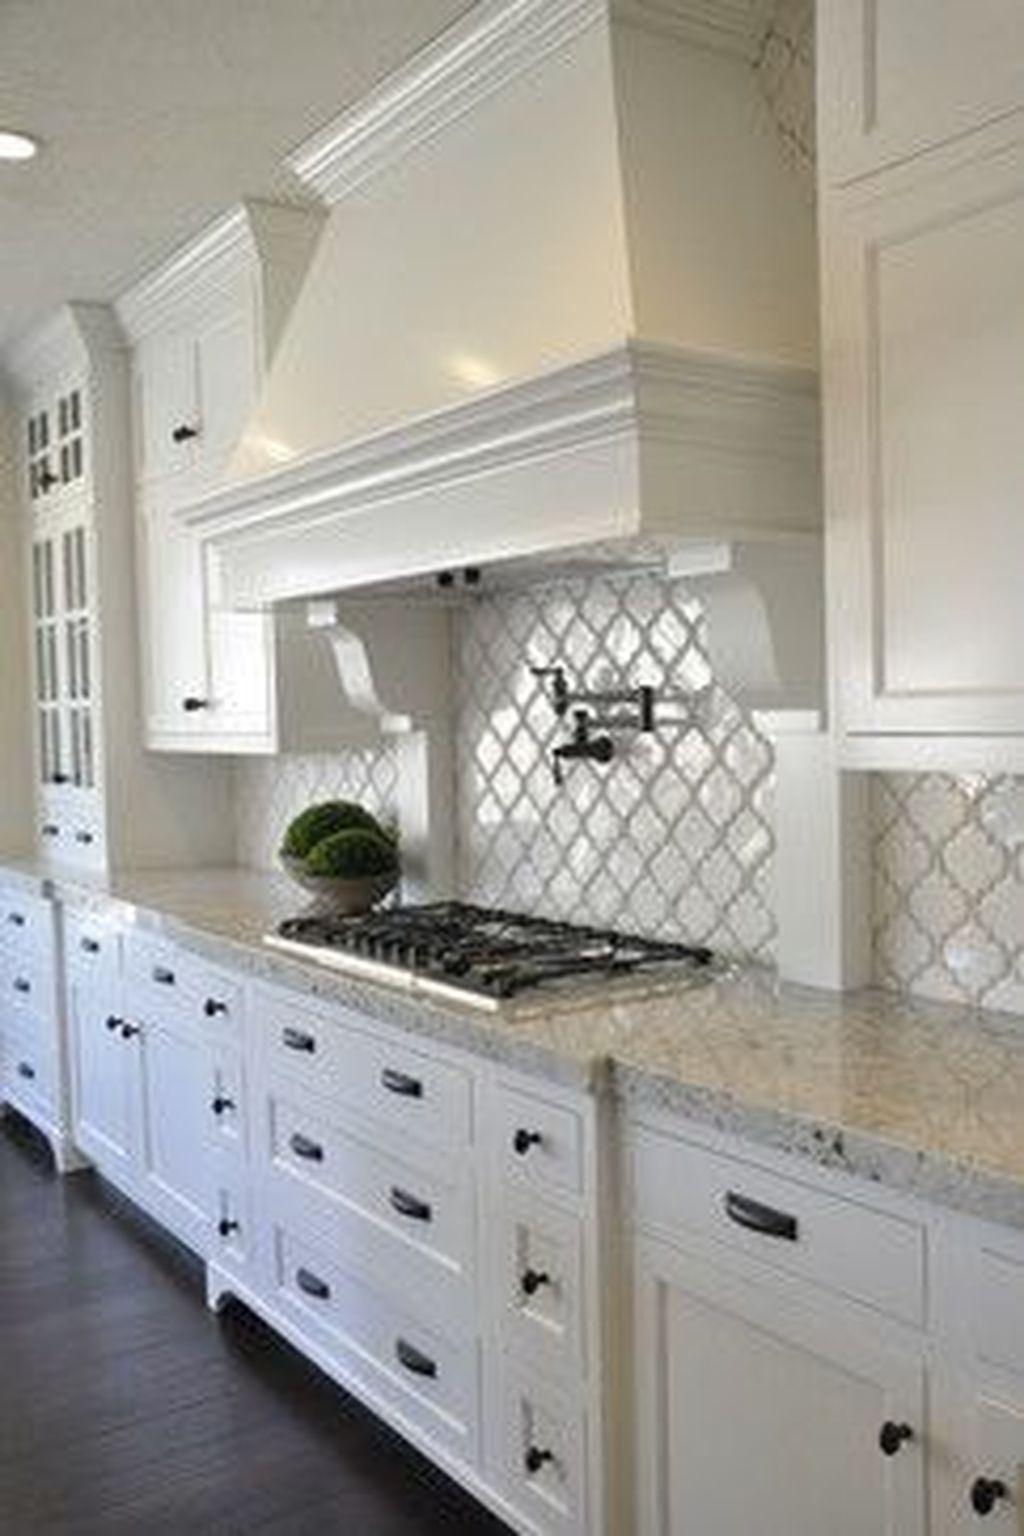 30 Amazing Design Ideas For A Kitchen Backsplash: 30+ Beautiful Kitchen Remodel Backsplash Tile Design Ideas